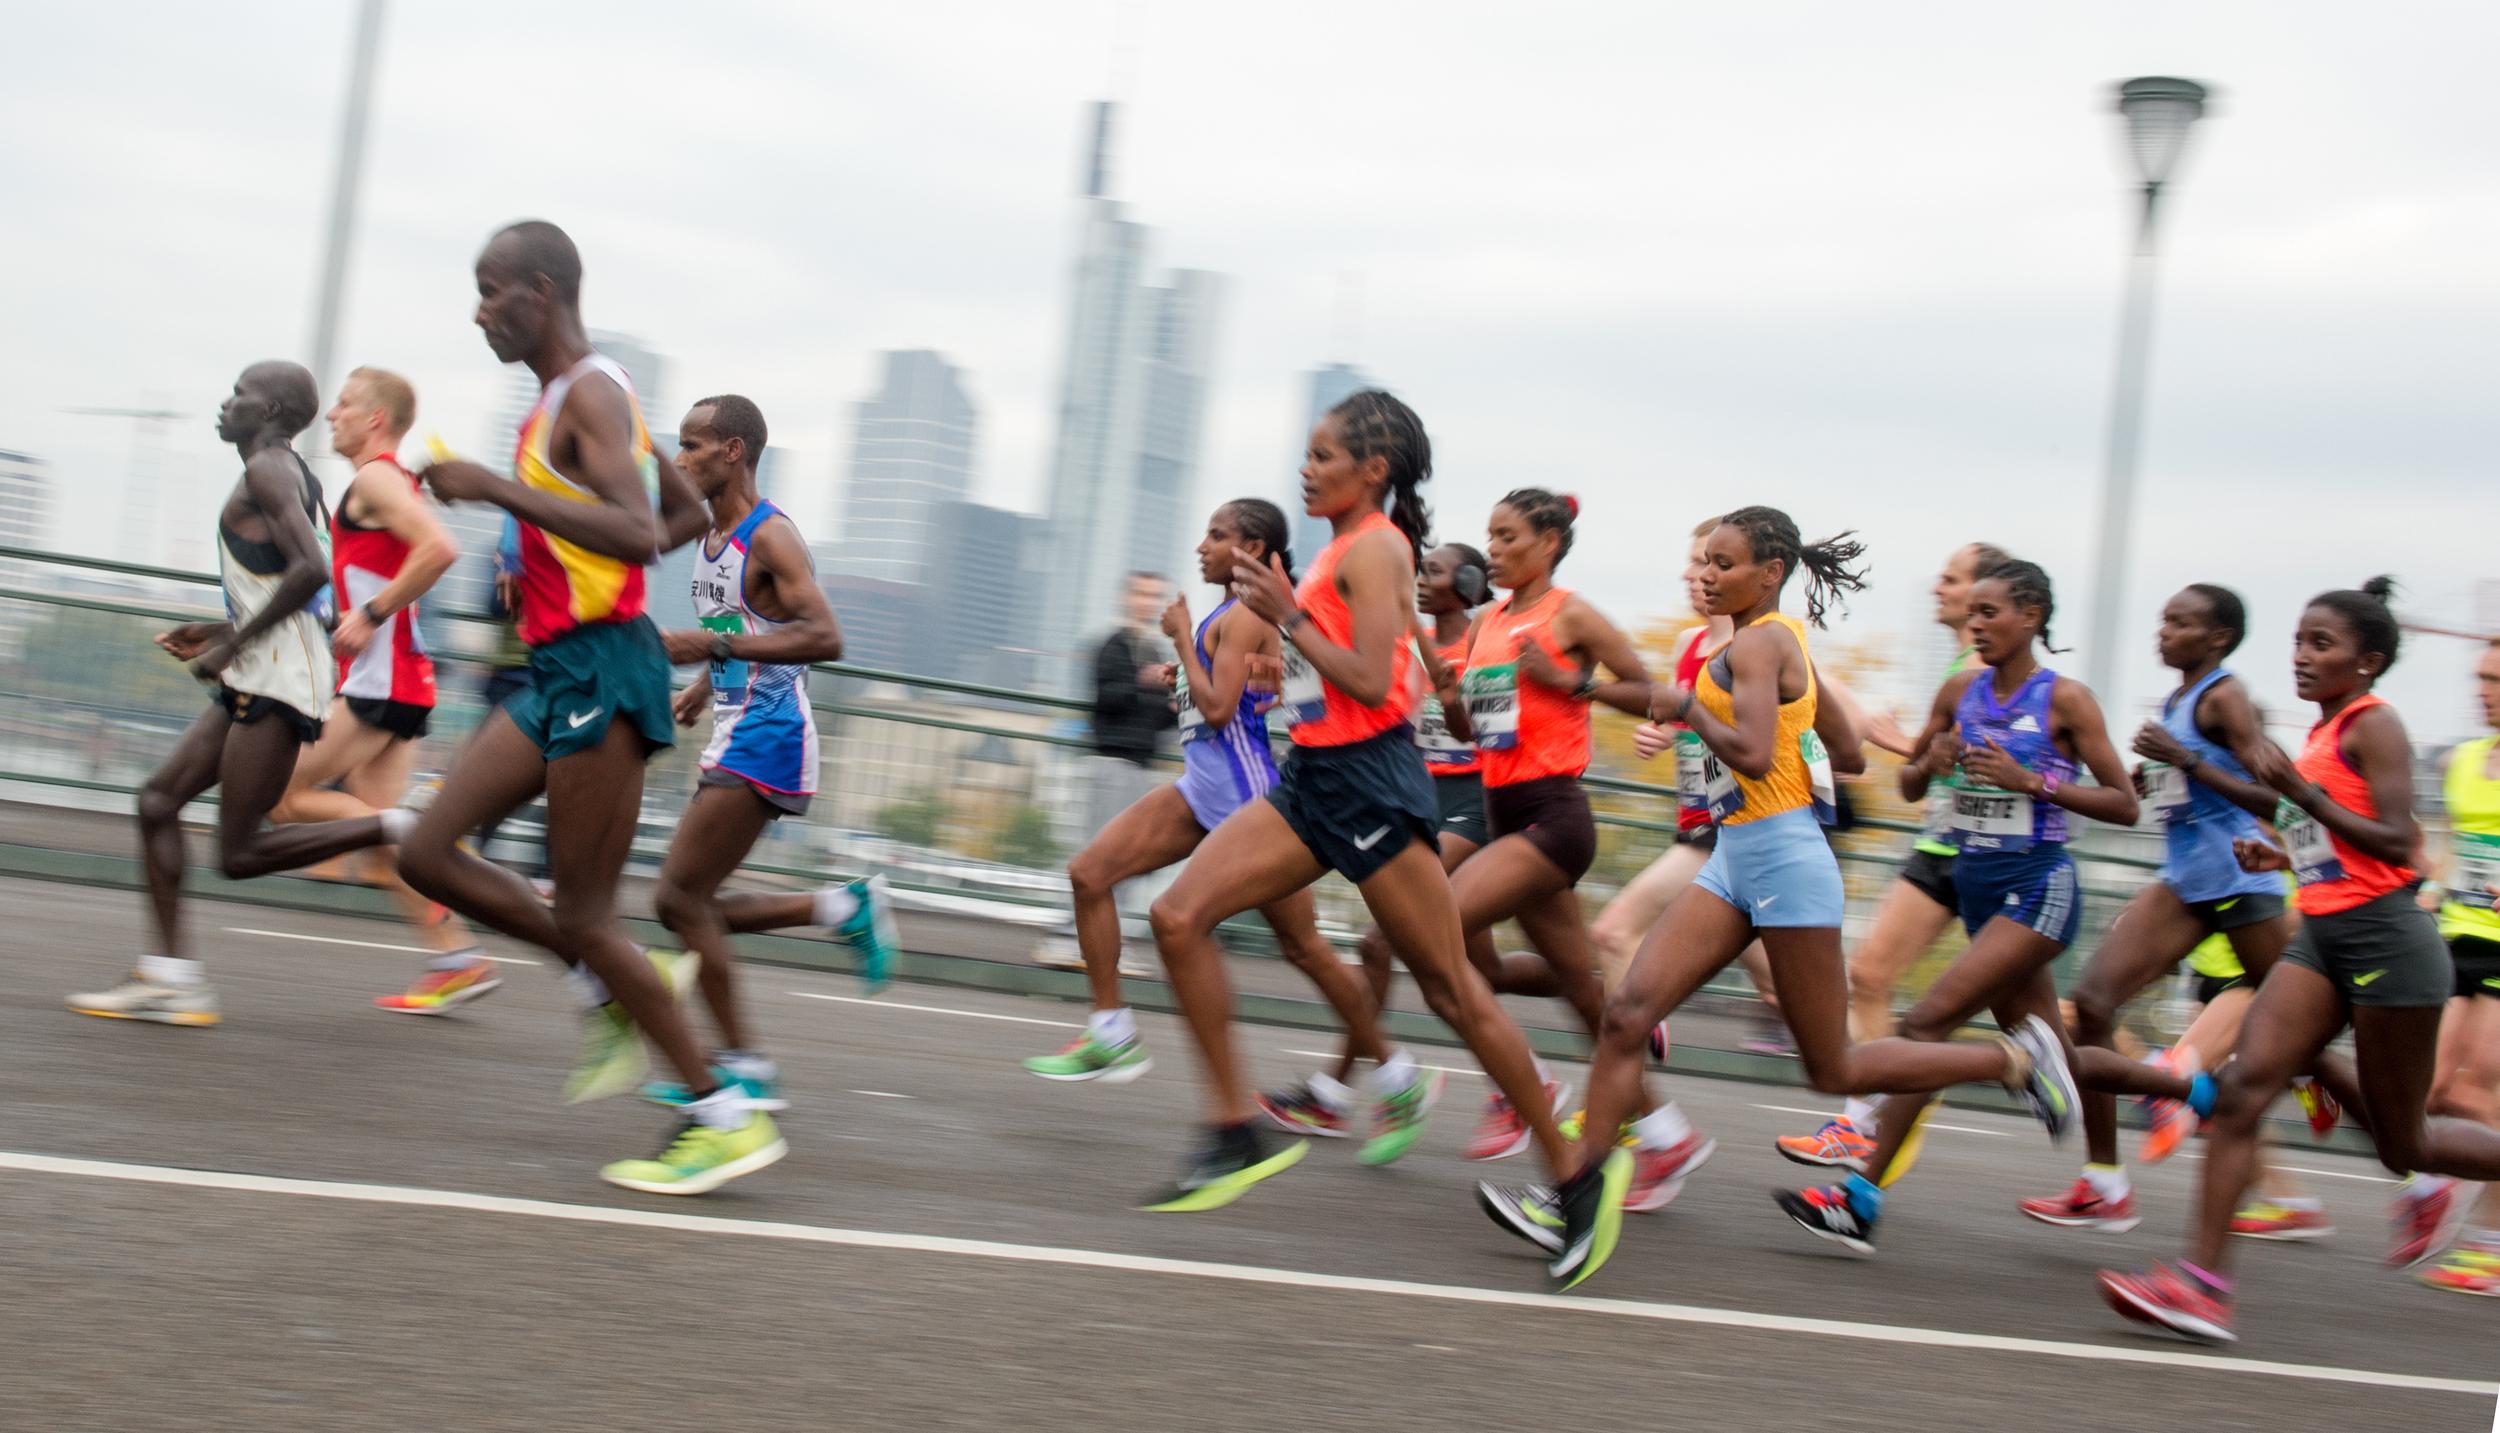 Participants run across a bridge over river Main, during the Frankfurt marathon in Frankfurt, central Germany, Sunday Oct. 25, 2015. (AP)